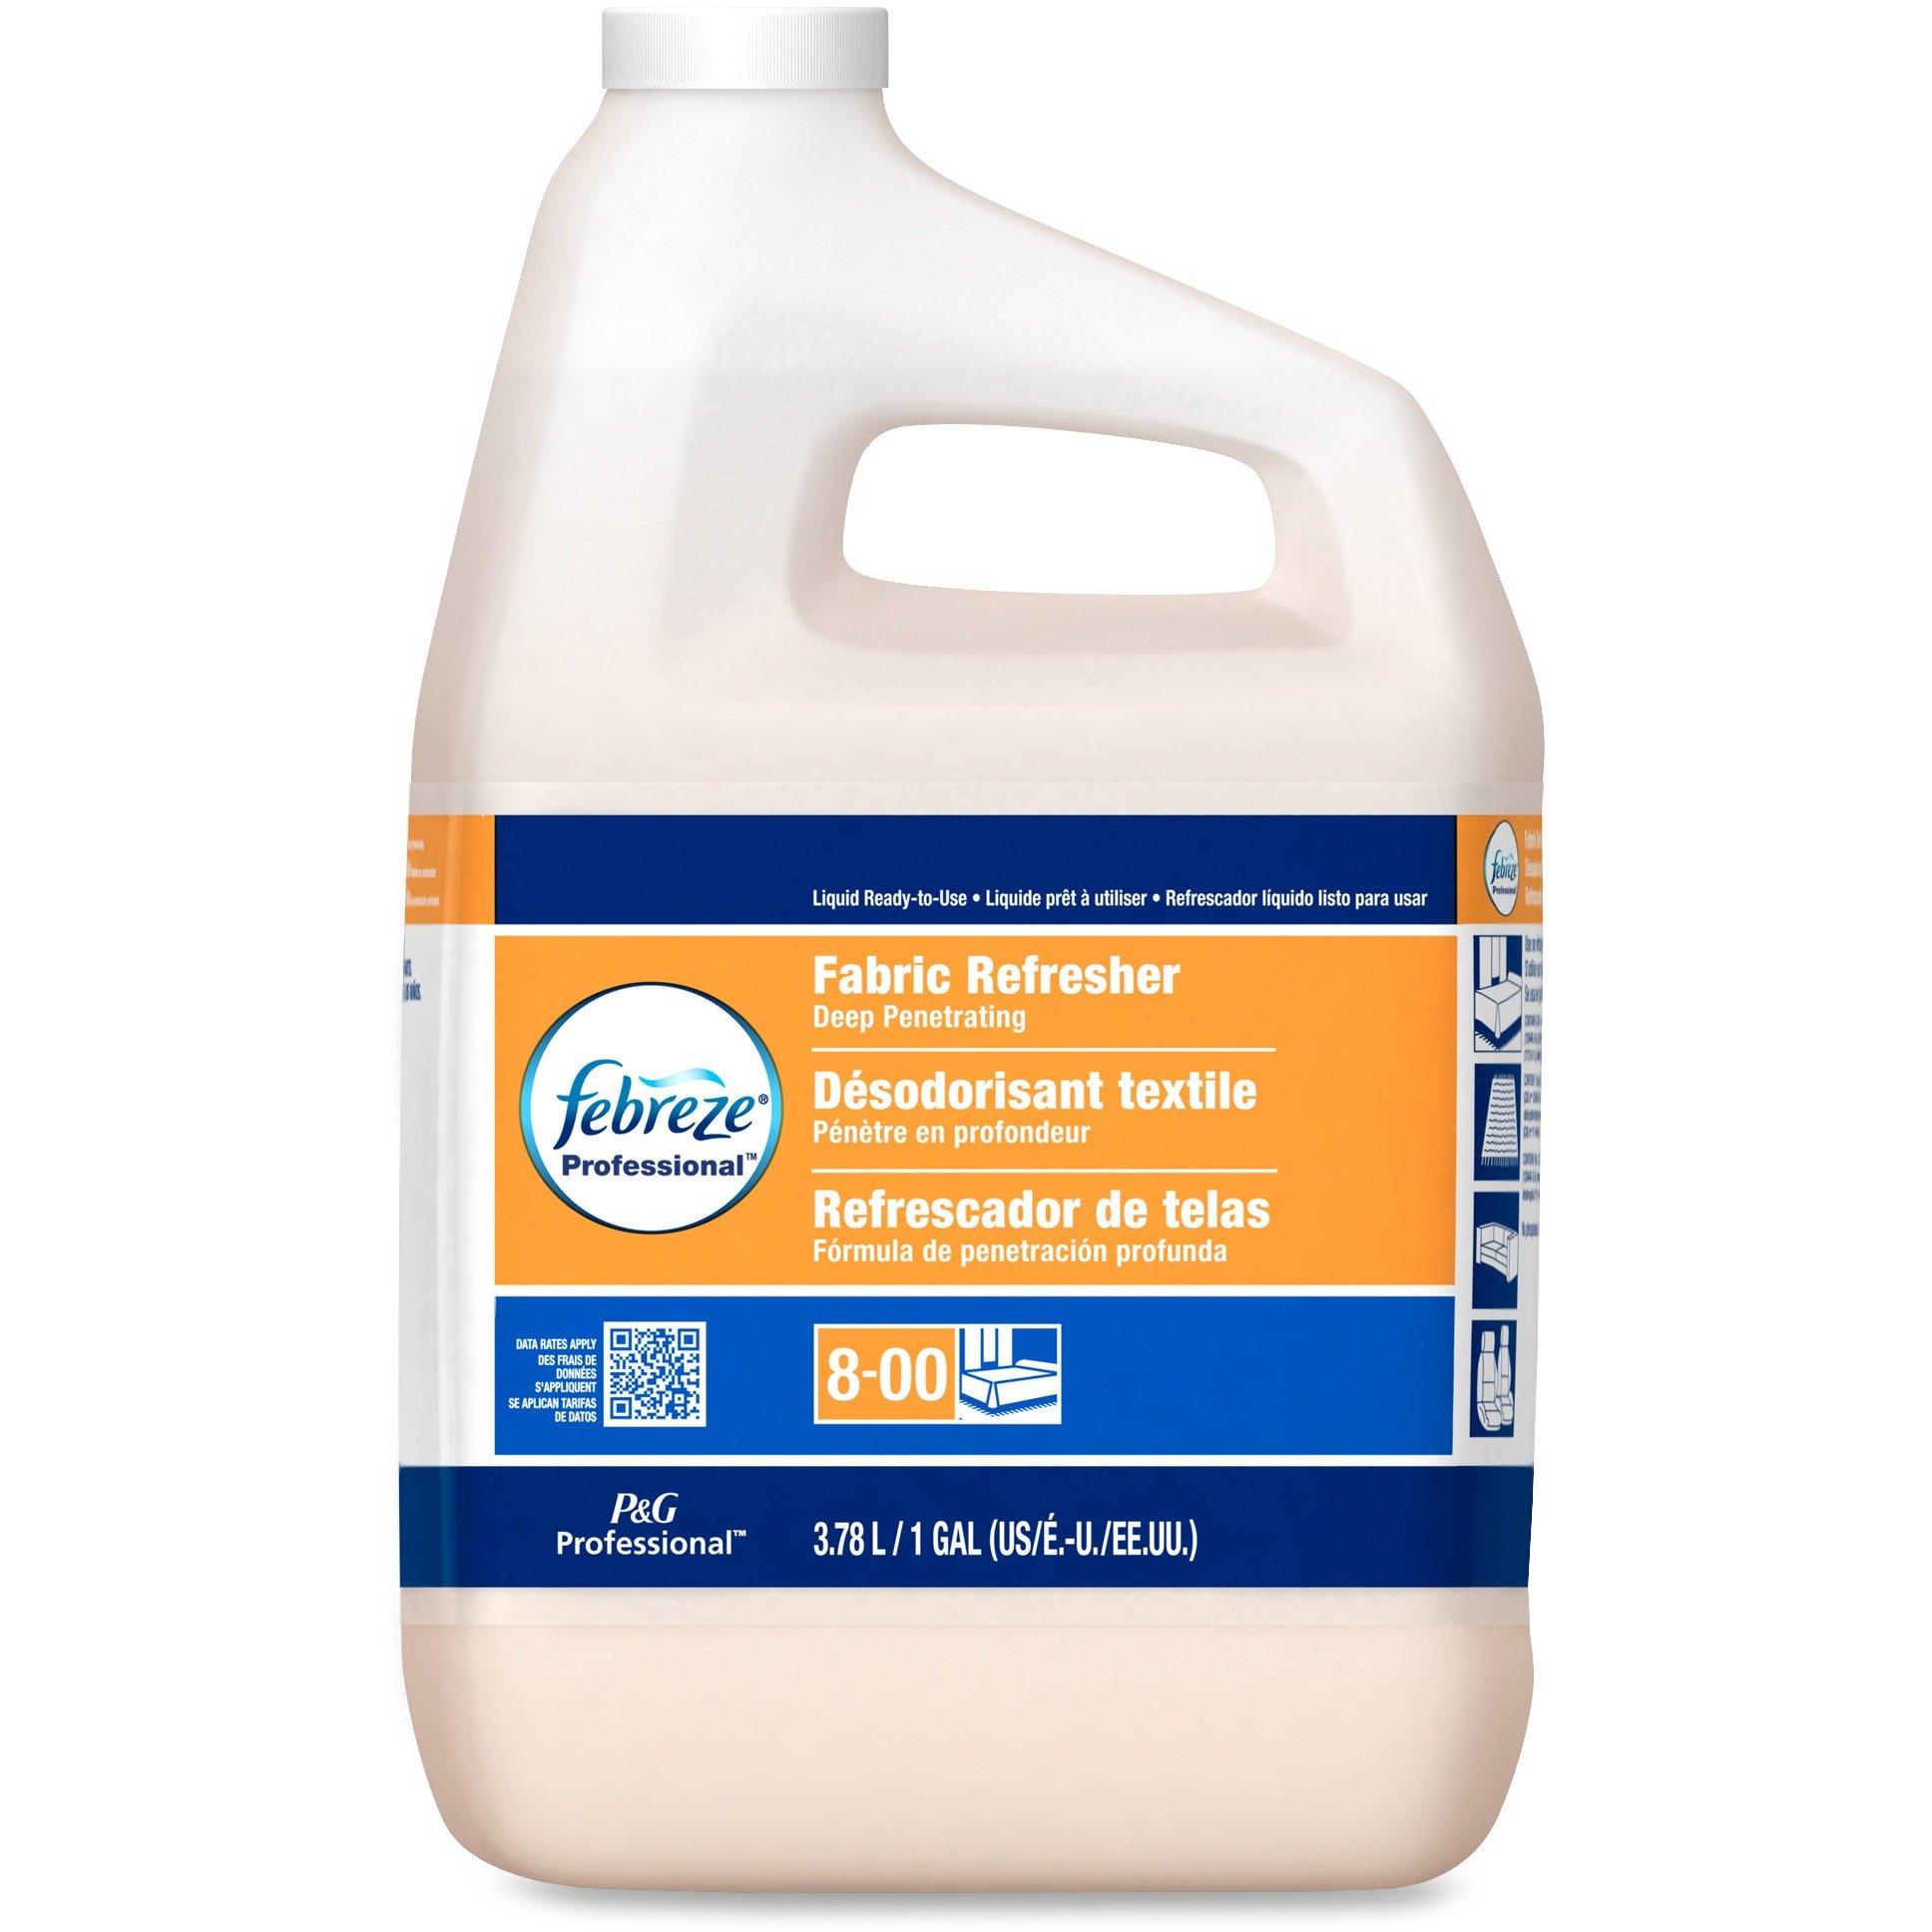 Febreze Fabric Refresher and Odor Eliminator